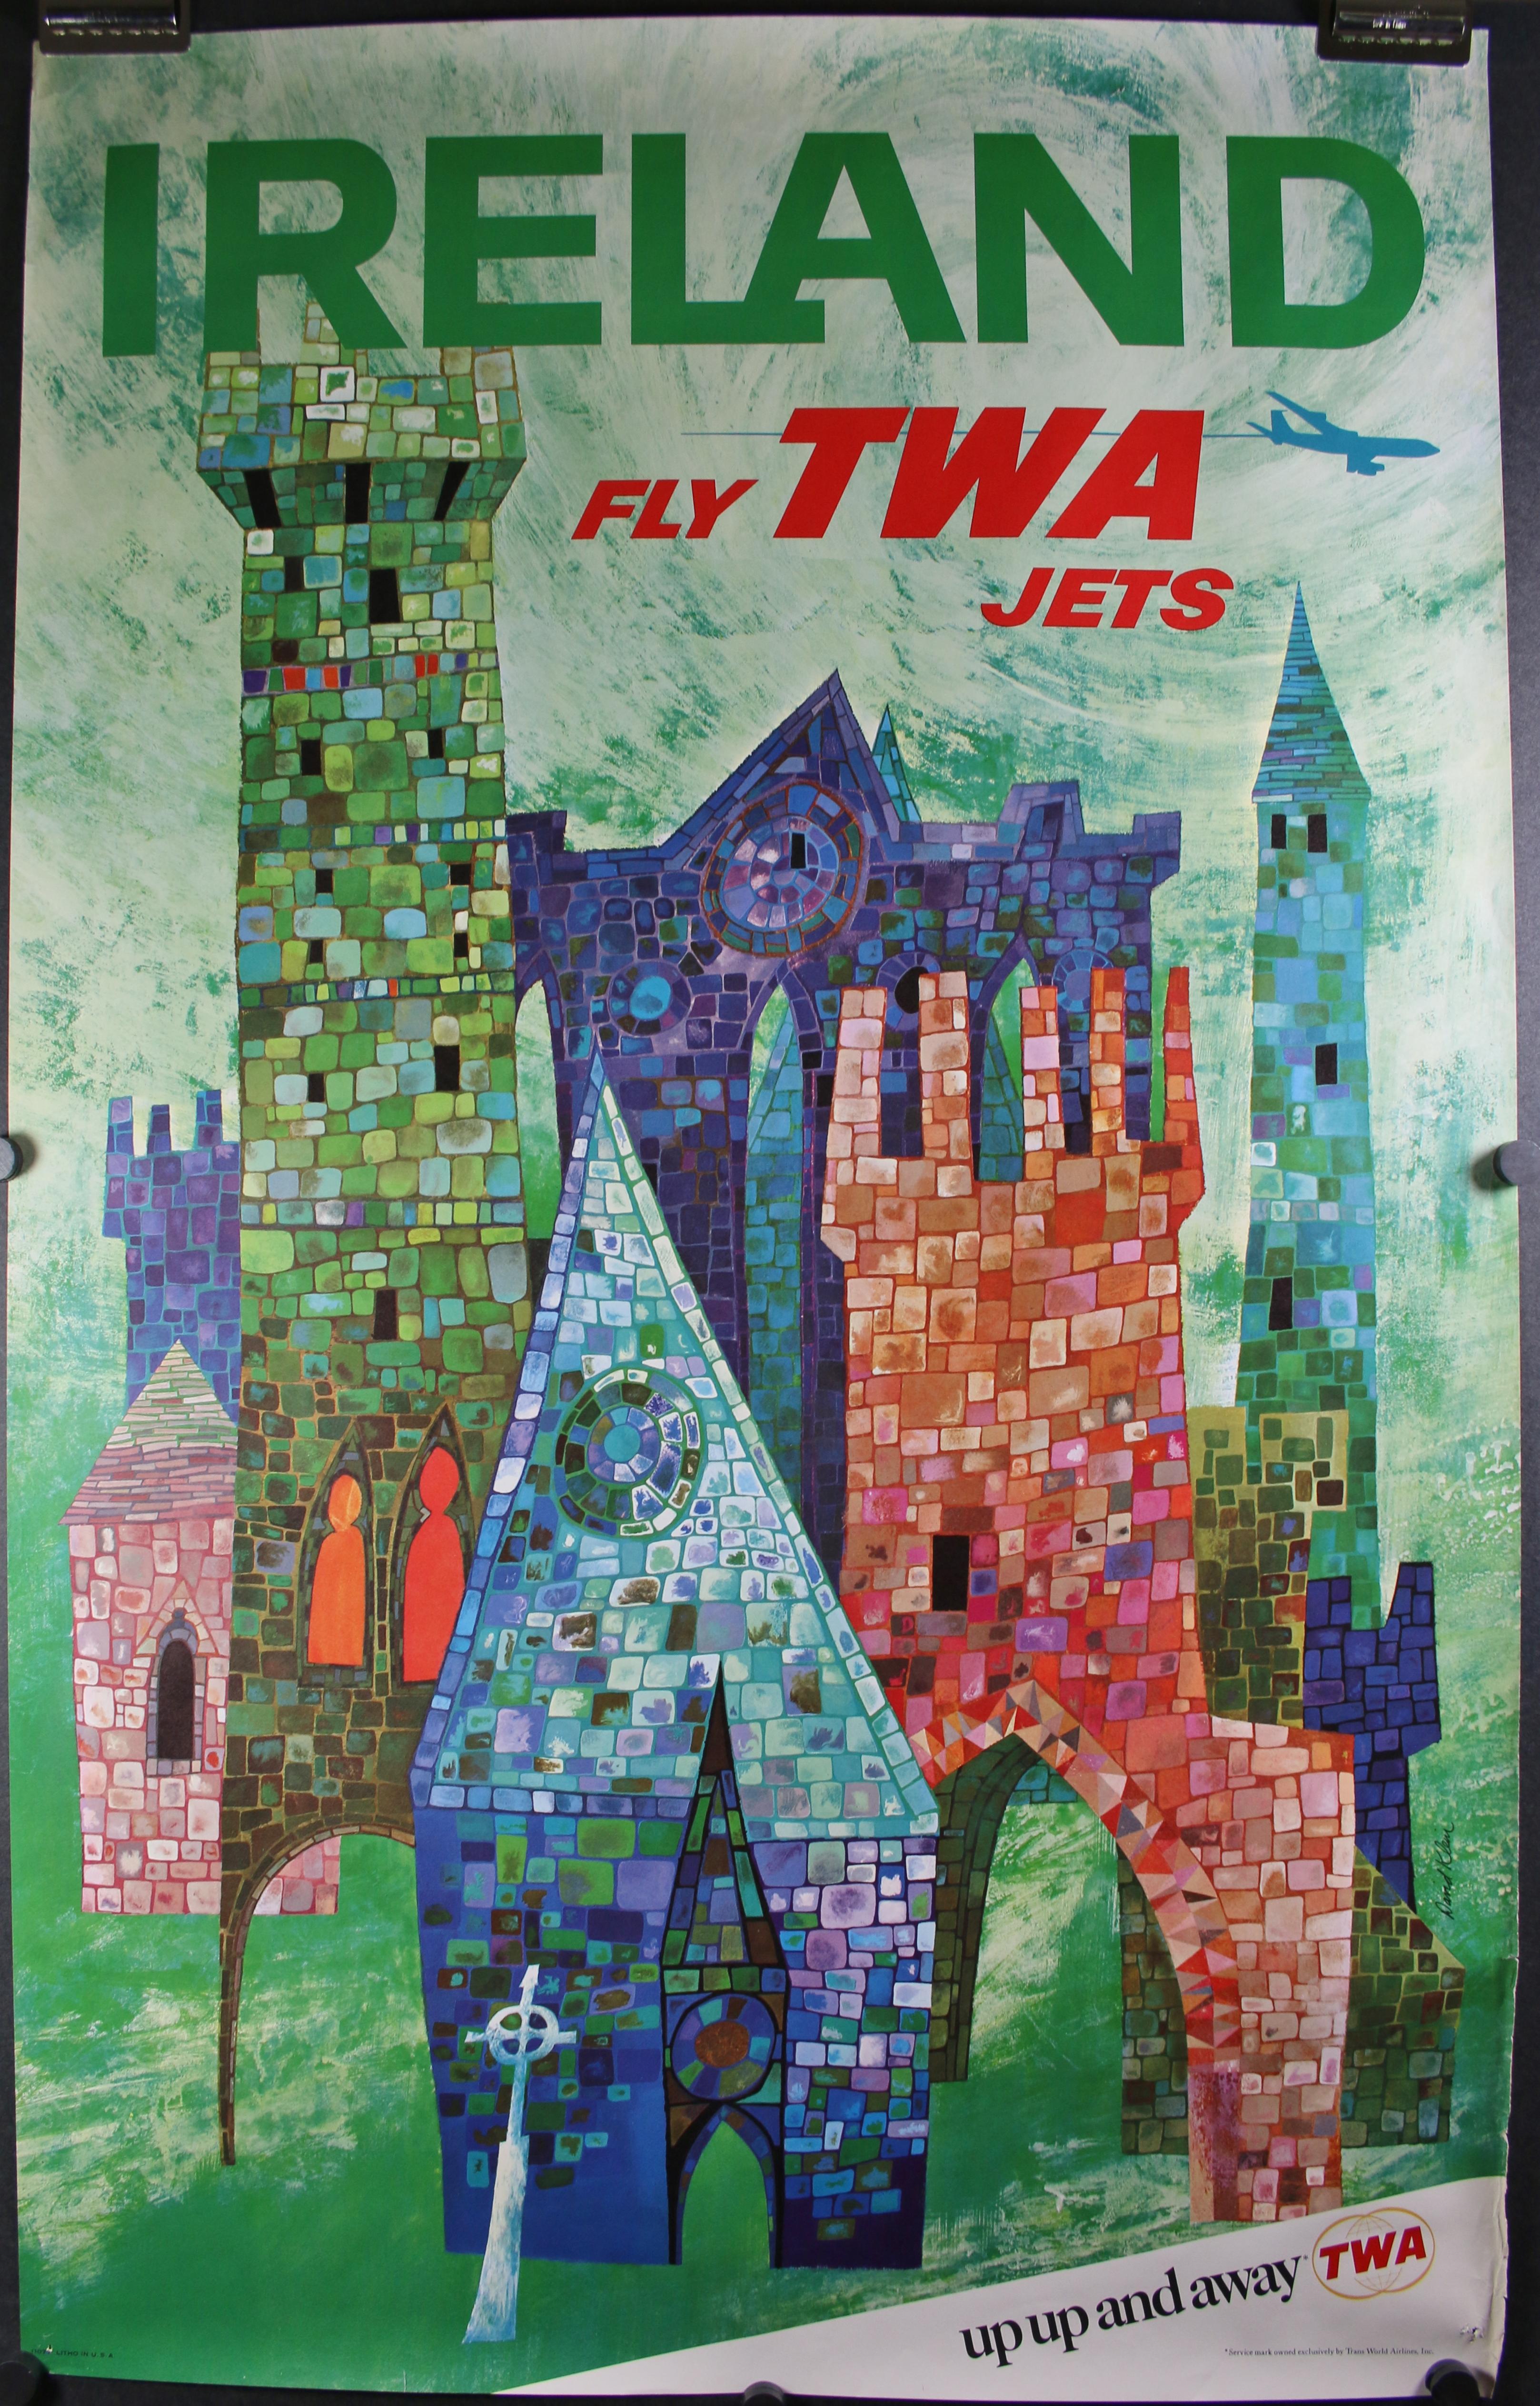 TWA Ireland 4589